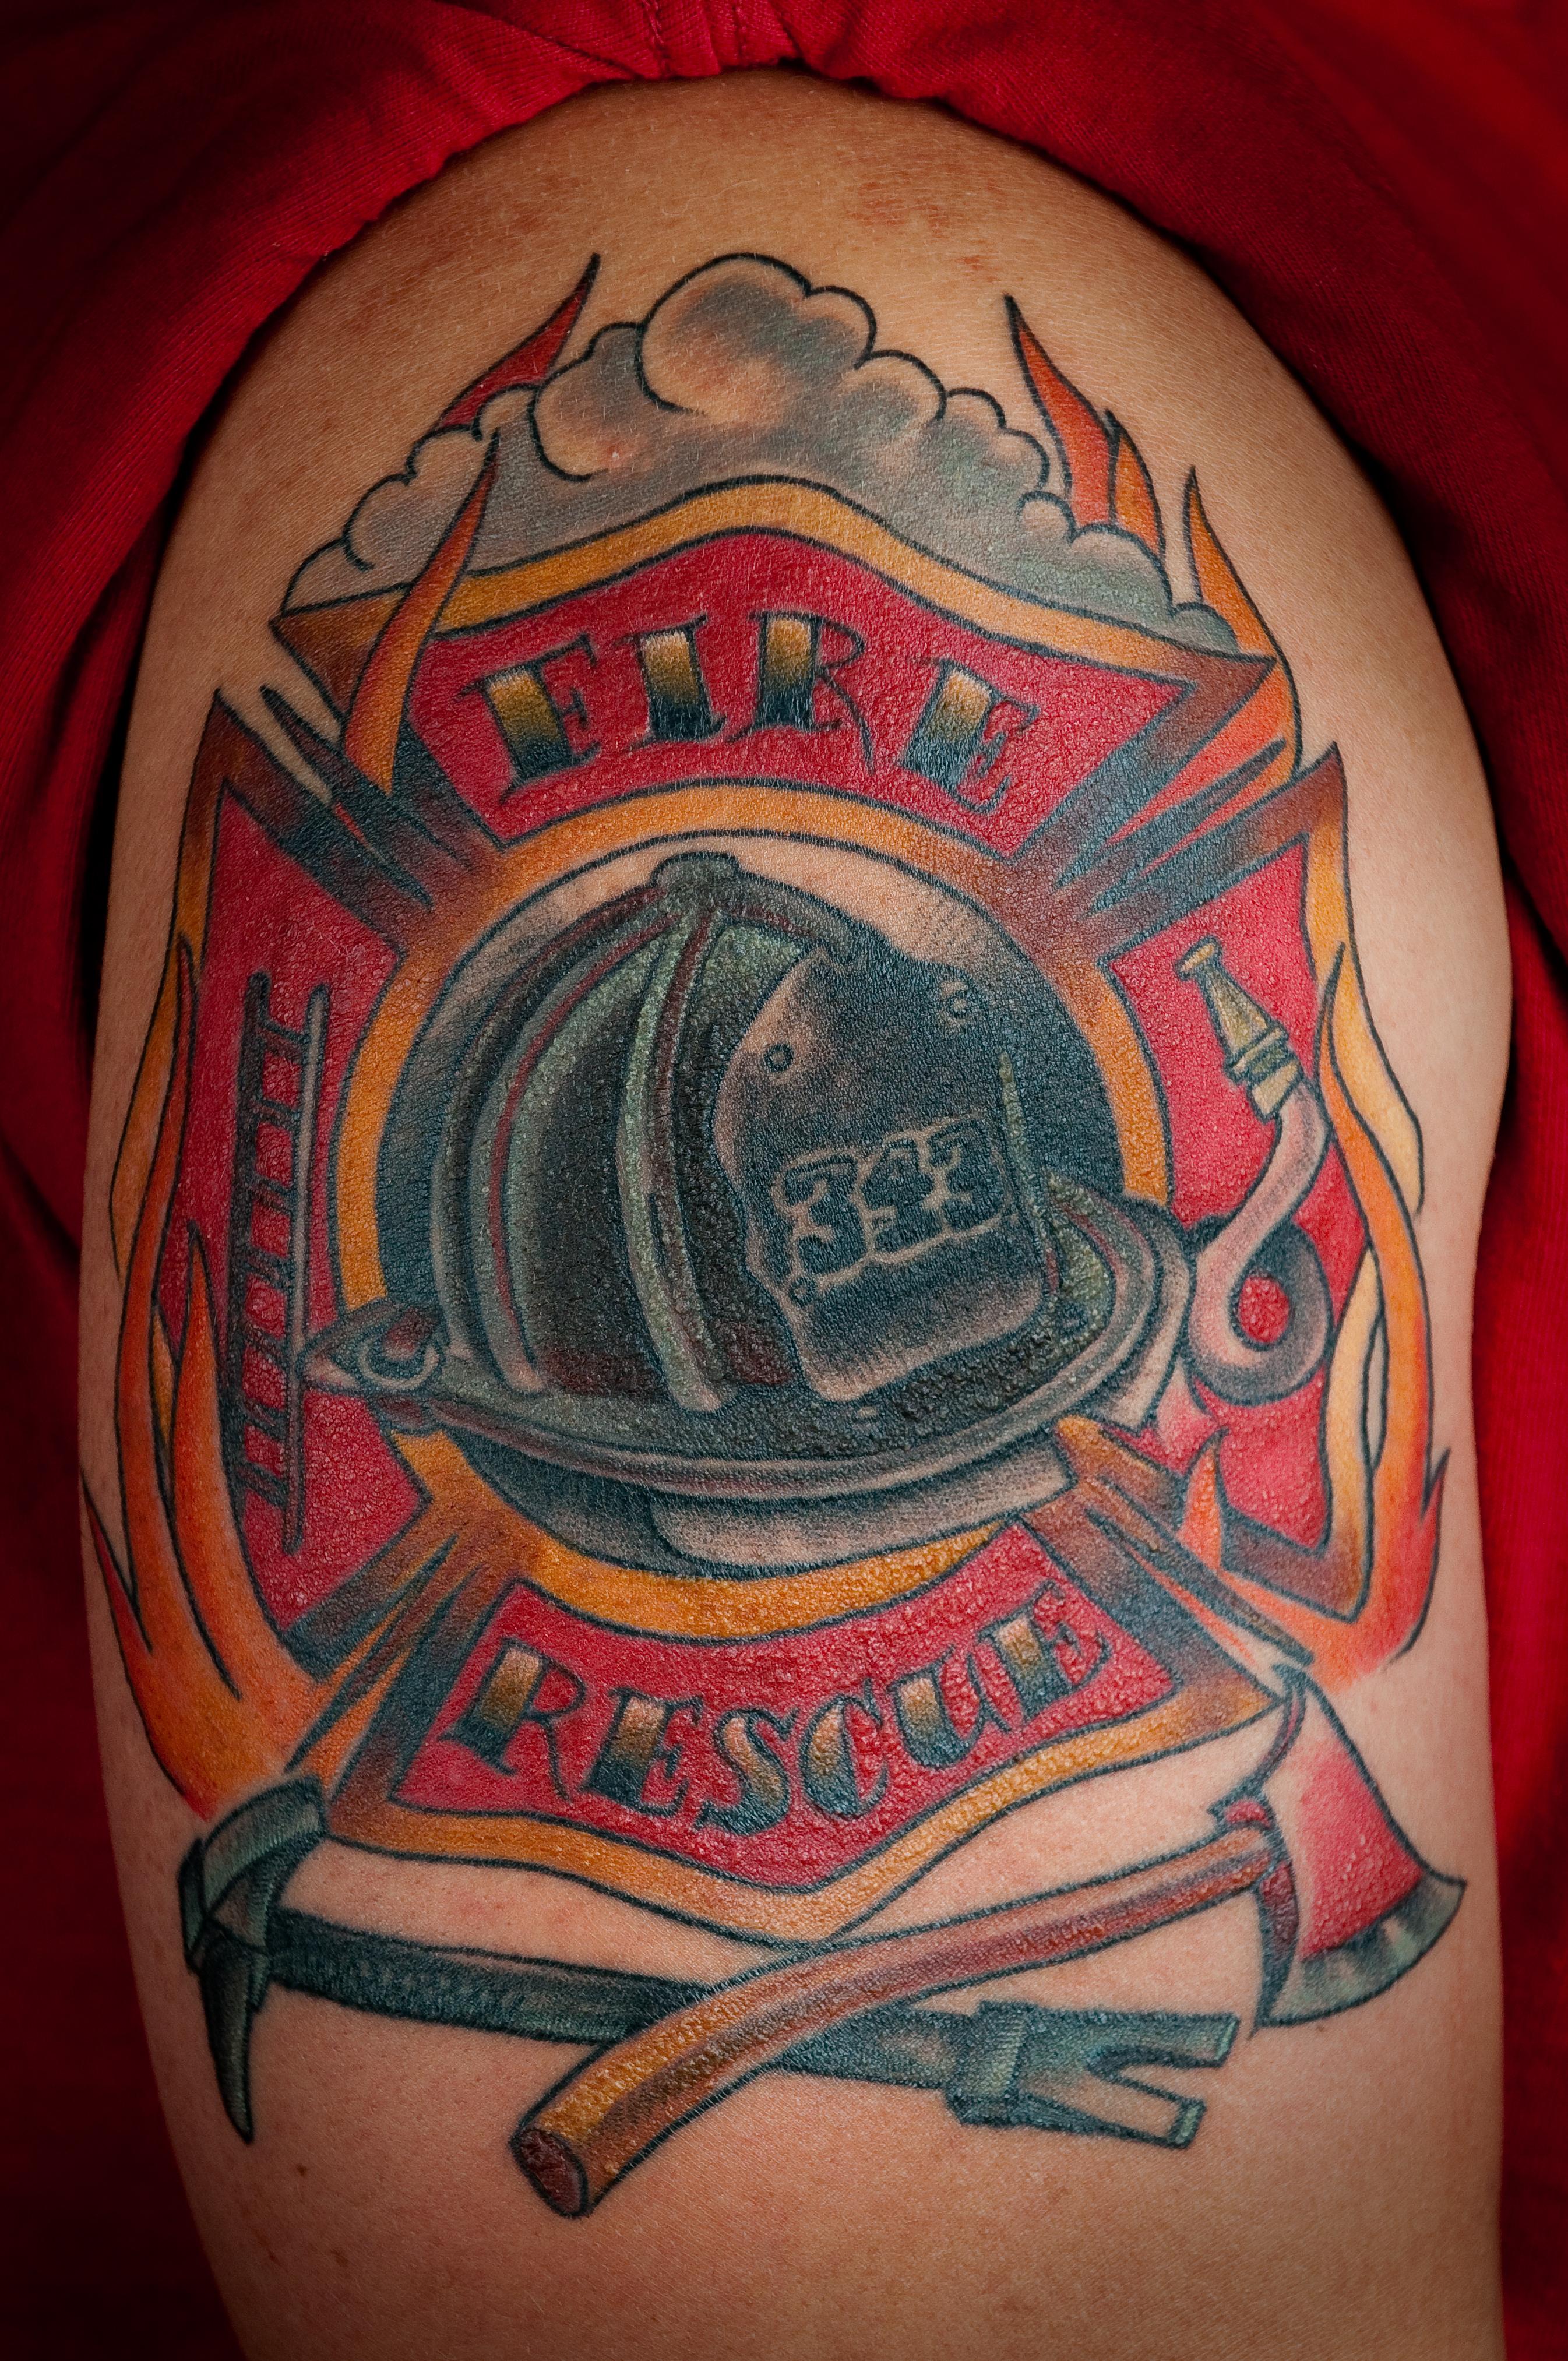 Firefighter Tattoo Designs: Firefighter Tattoo Images & Designs